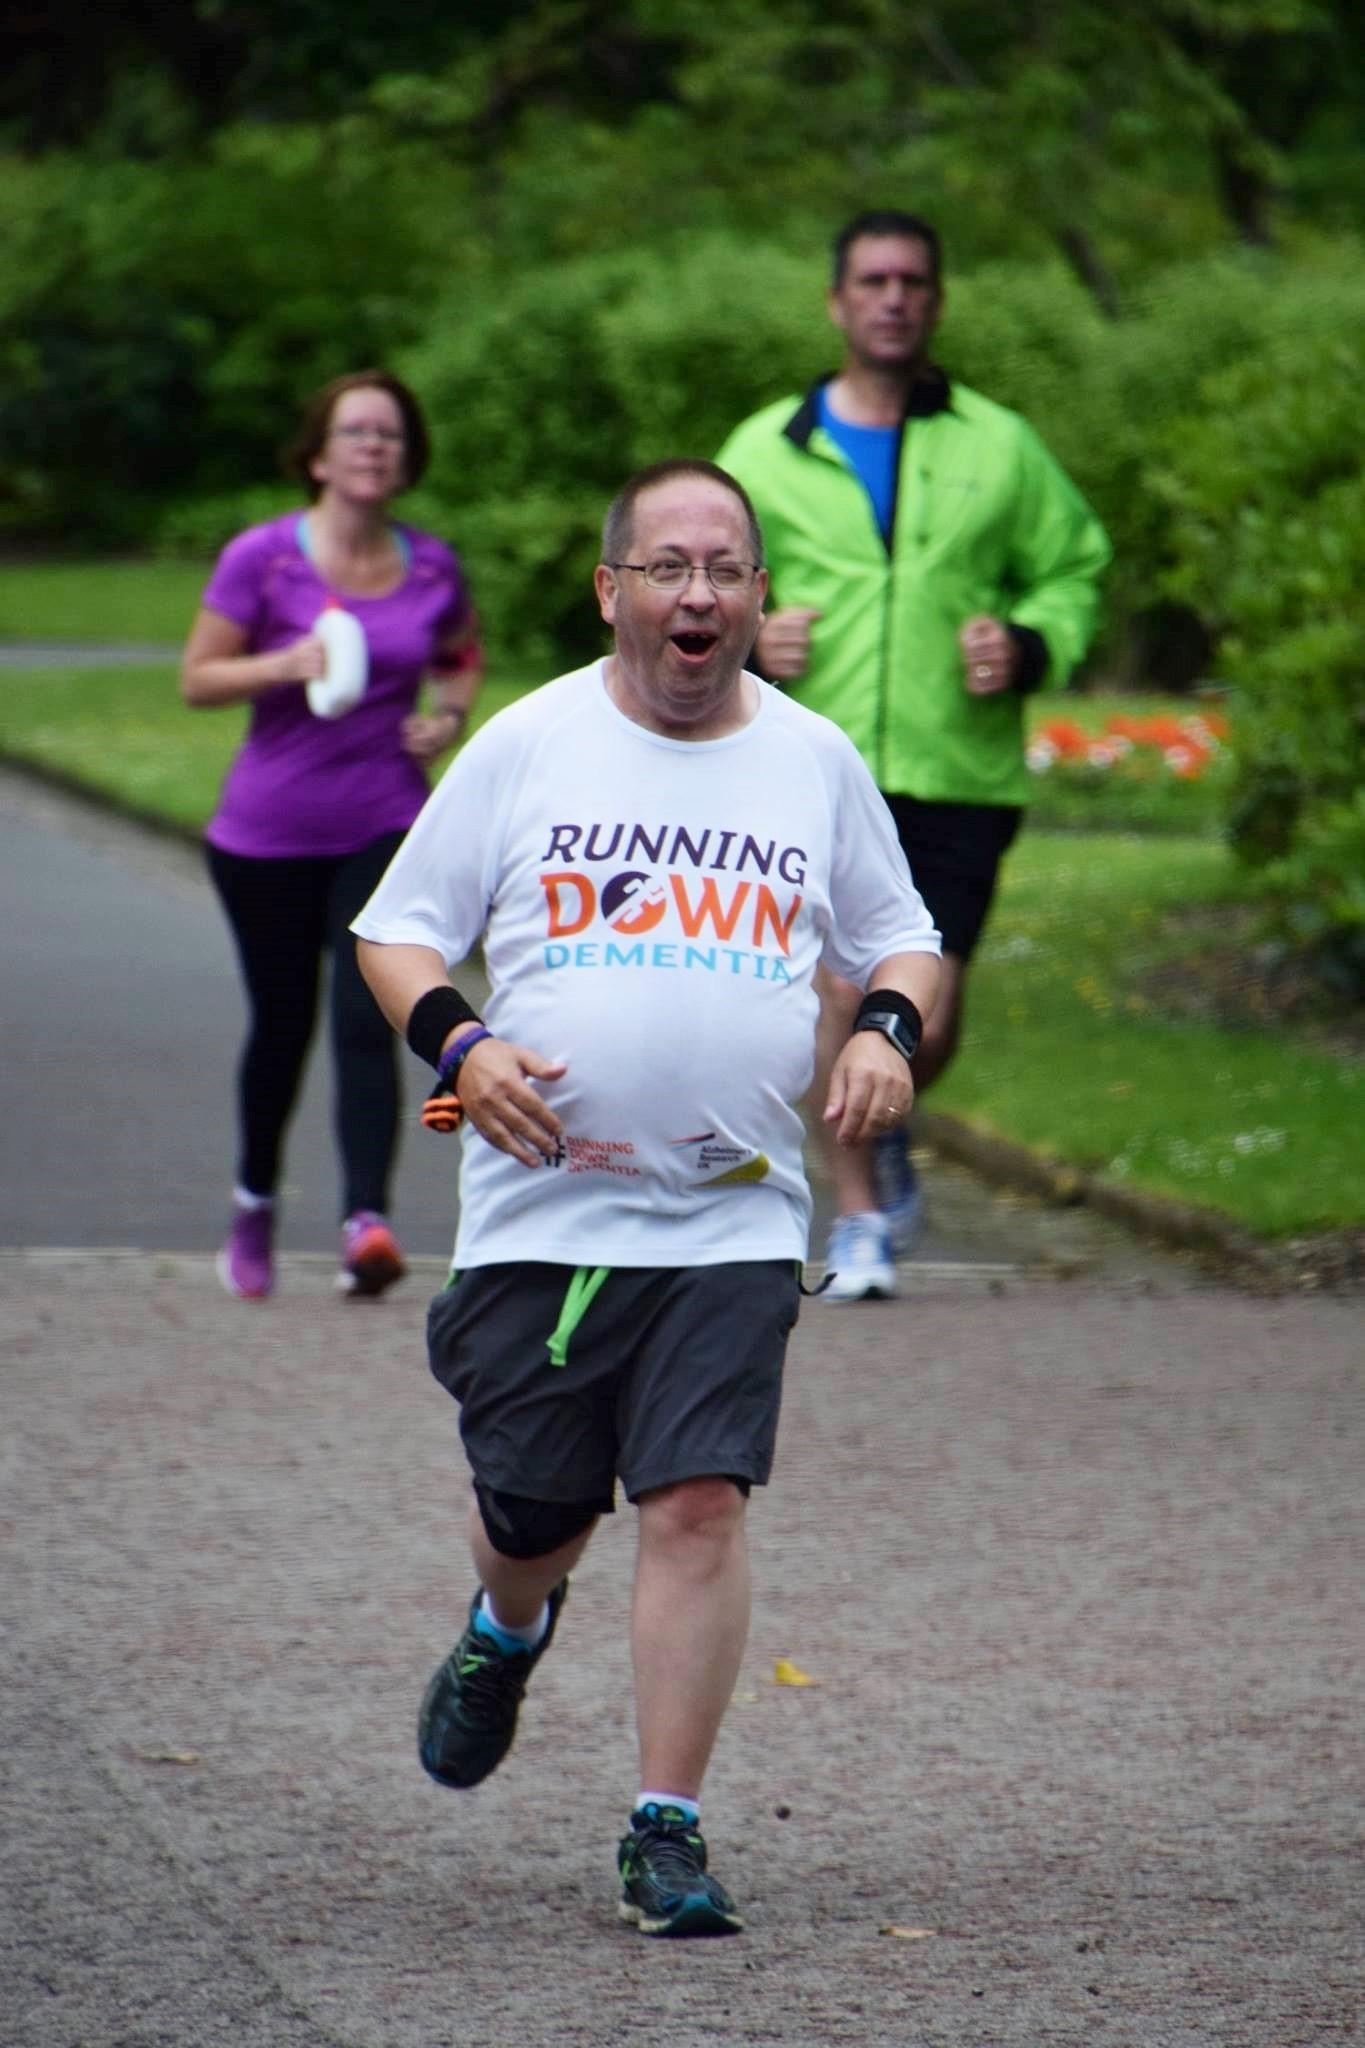 Richard Judd running down dementia